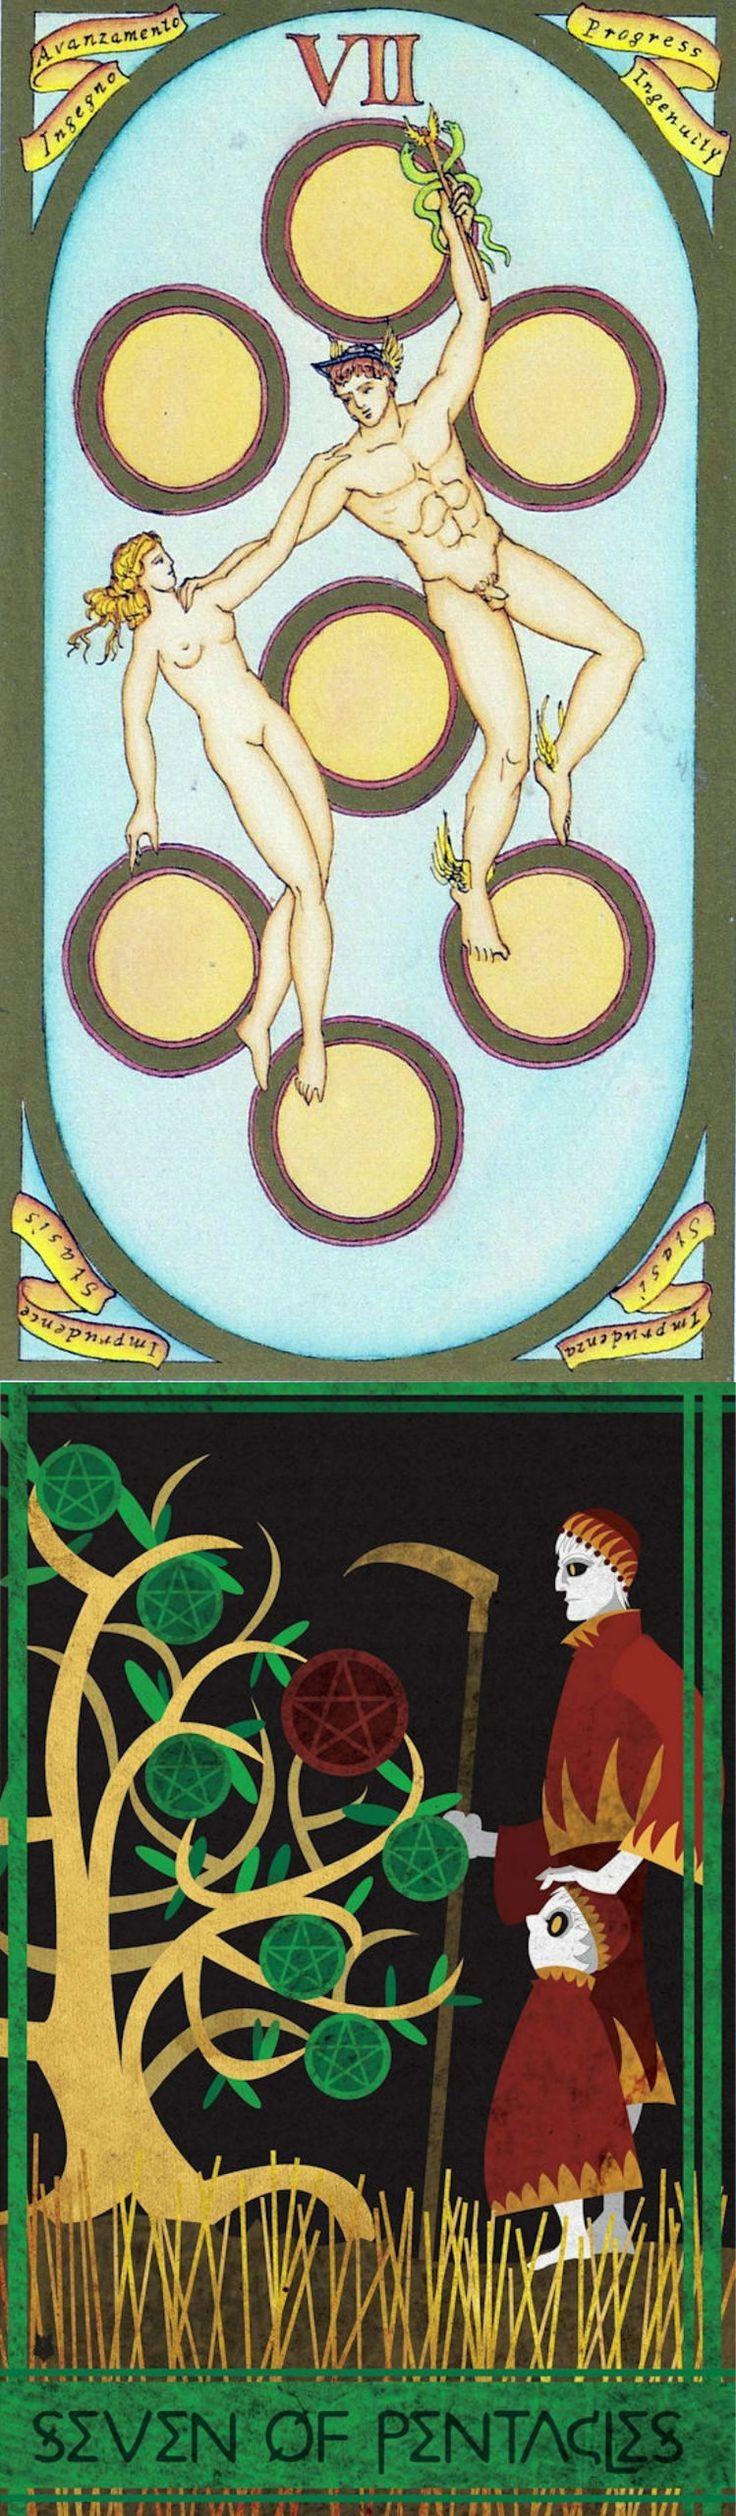 Seven of Pentacles: a little more work left and distraction (reverse). Renaissance Tarot deck and Ellis Tarot deck: tarot live yes no, free dark tarot and tarot web. The best gothic decor and fortune telling cards. #tarotapp #magician #hangedman #chariot #ios #tarotdecks